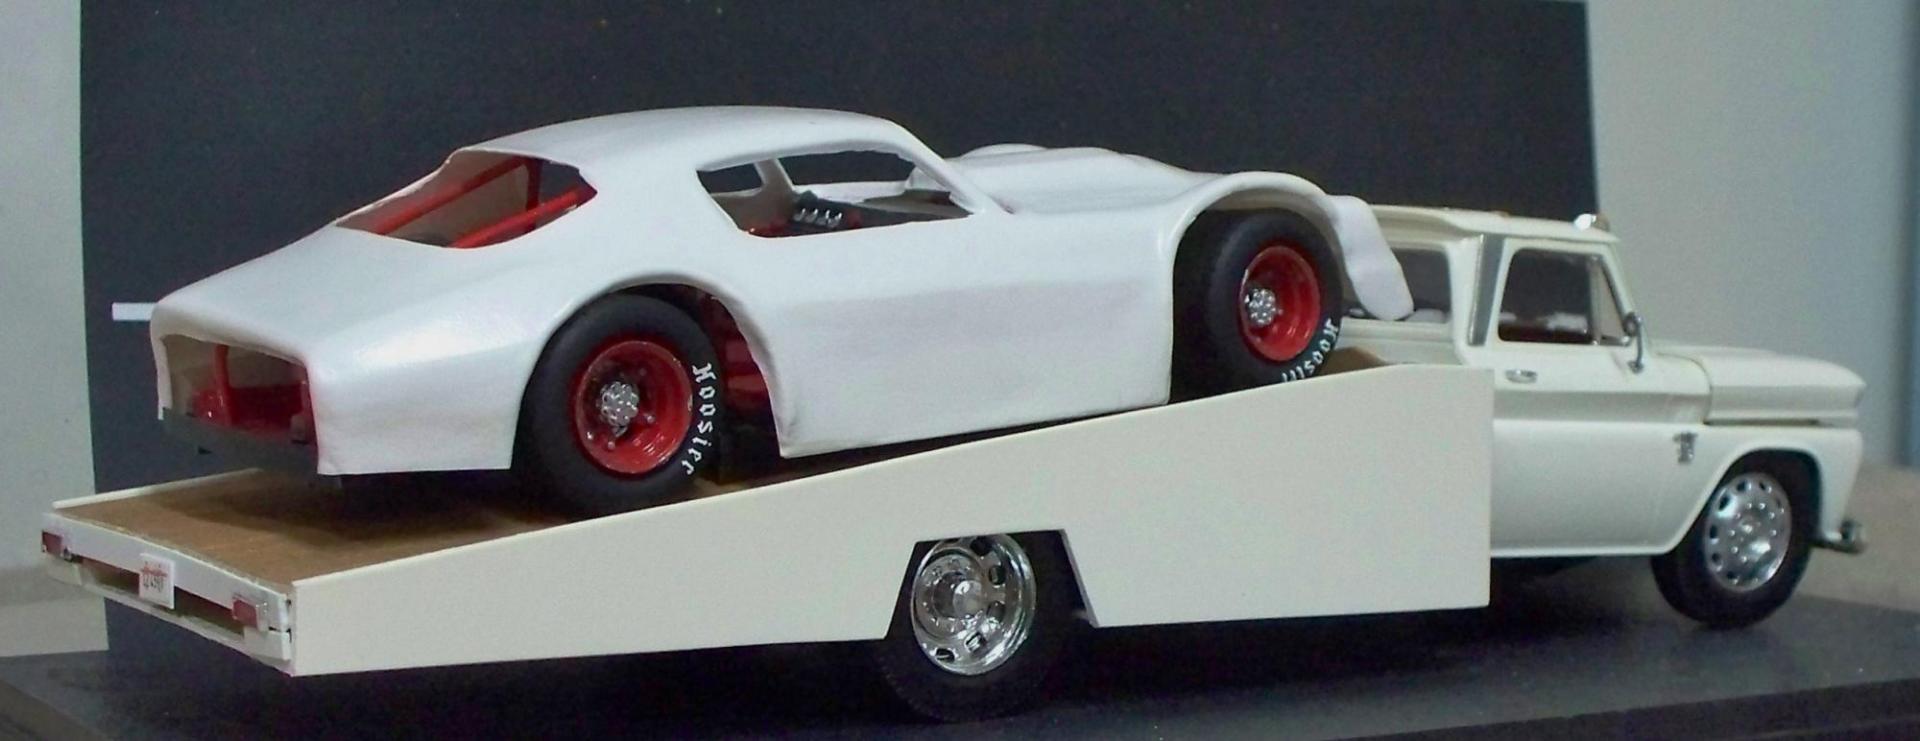 Custom Decals Printer Ideas Nascar Model Cars